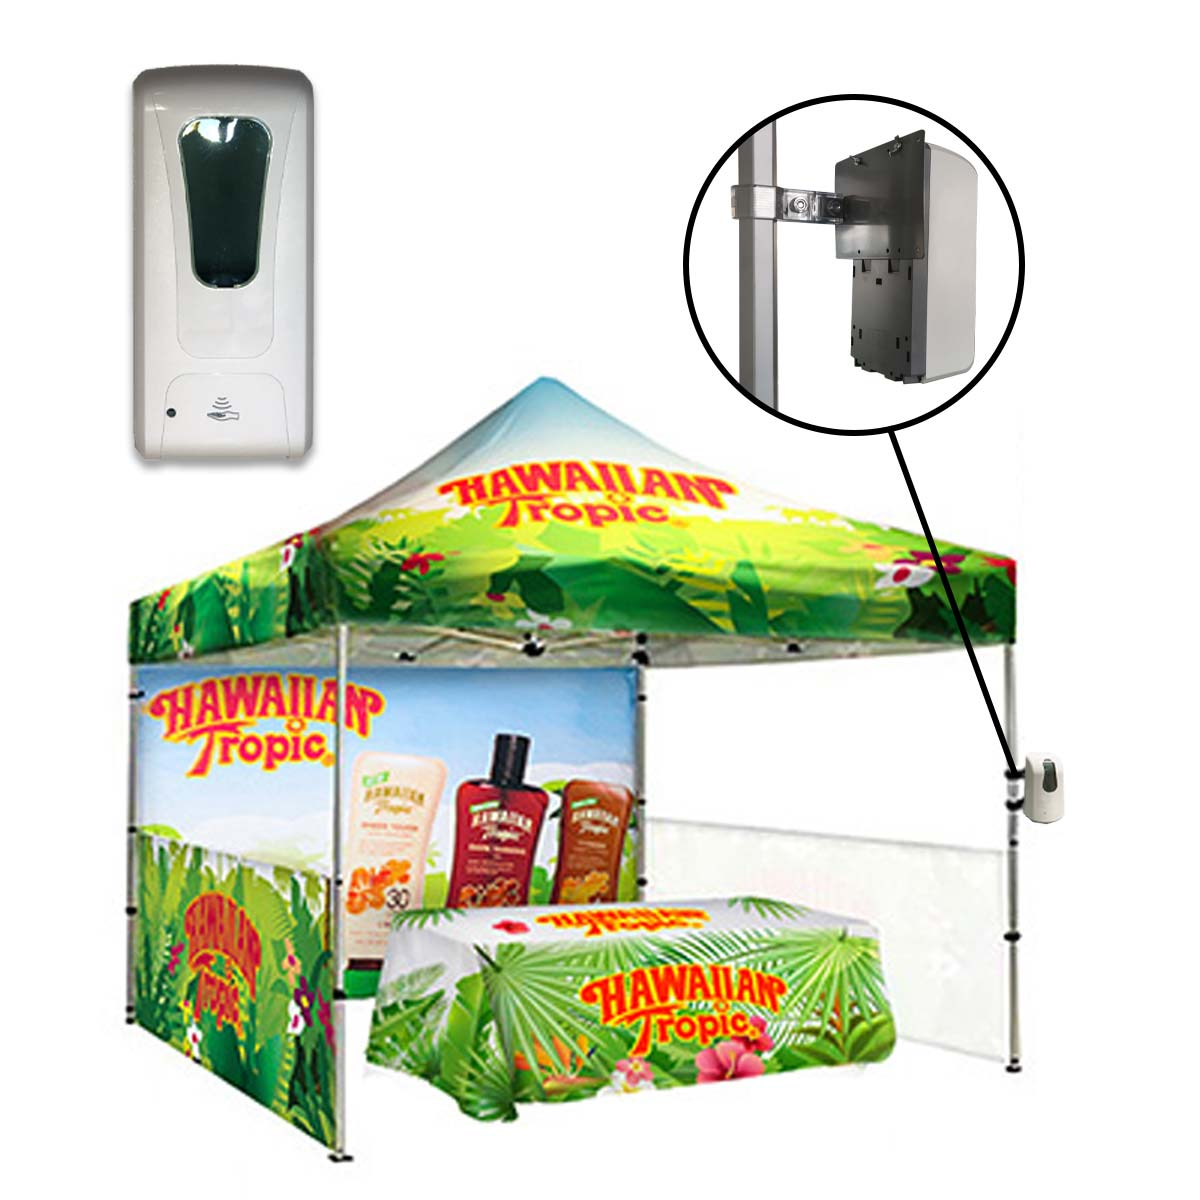 Automatic Sanitizer Dispenser For Tents